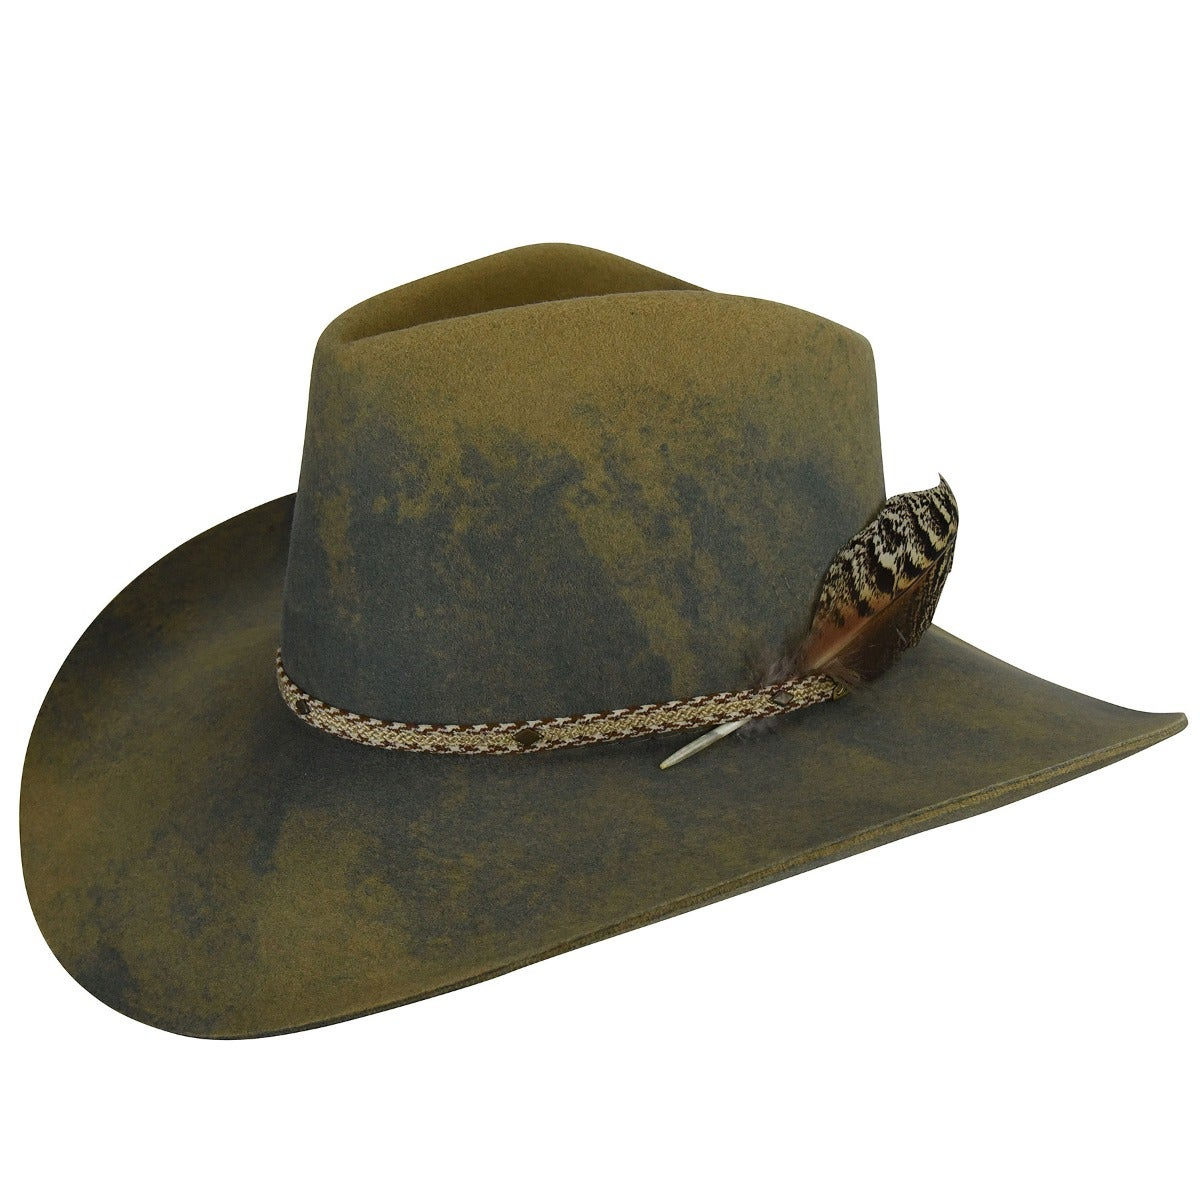 Renegade Renegade by Bailey Lucius Western Hat in Camel,Lite Steel Swirl